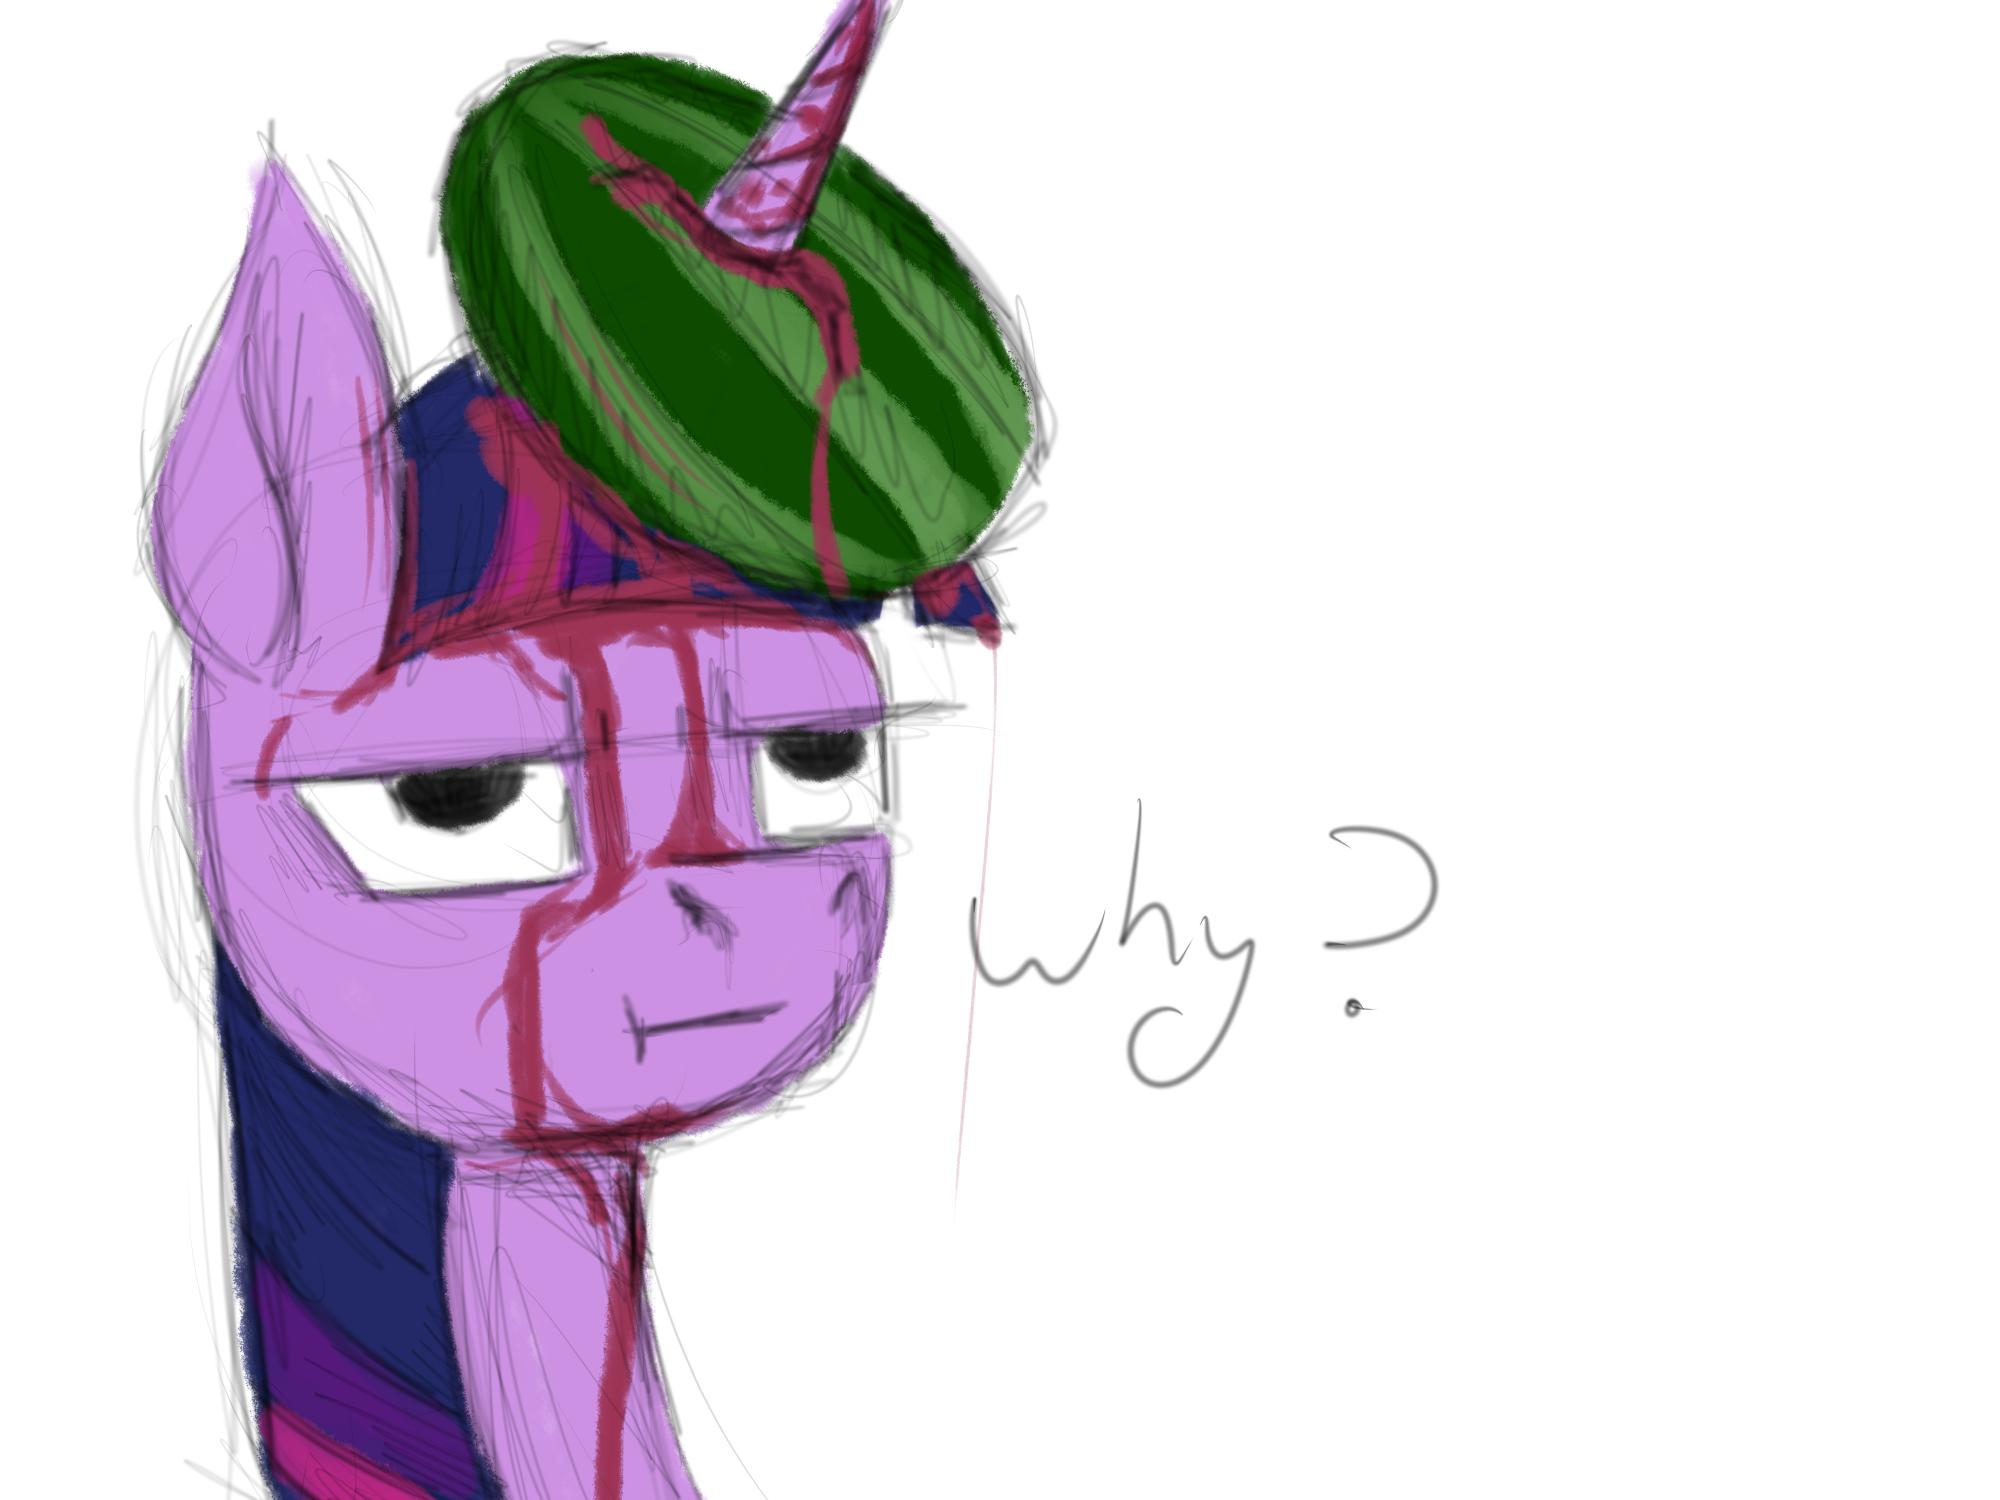 twilight hates melons